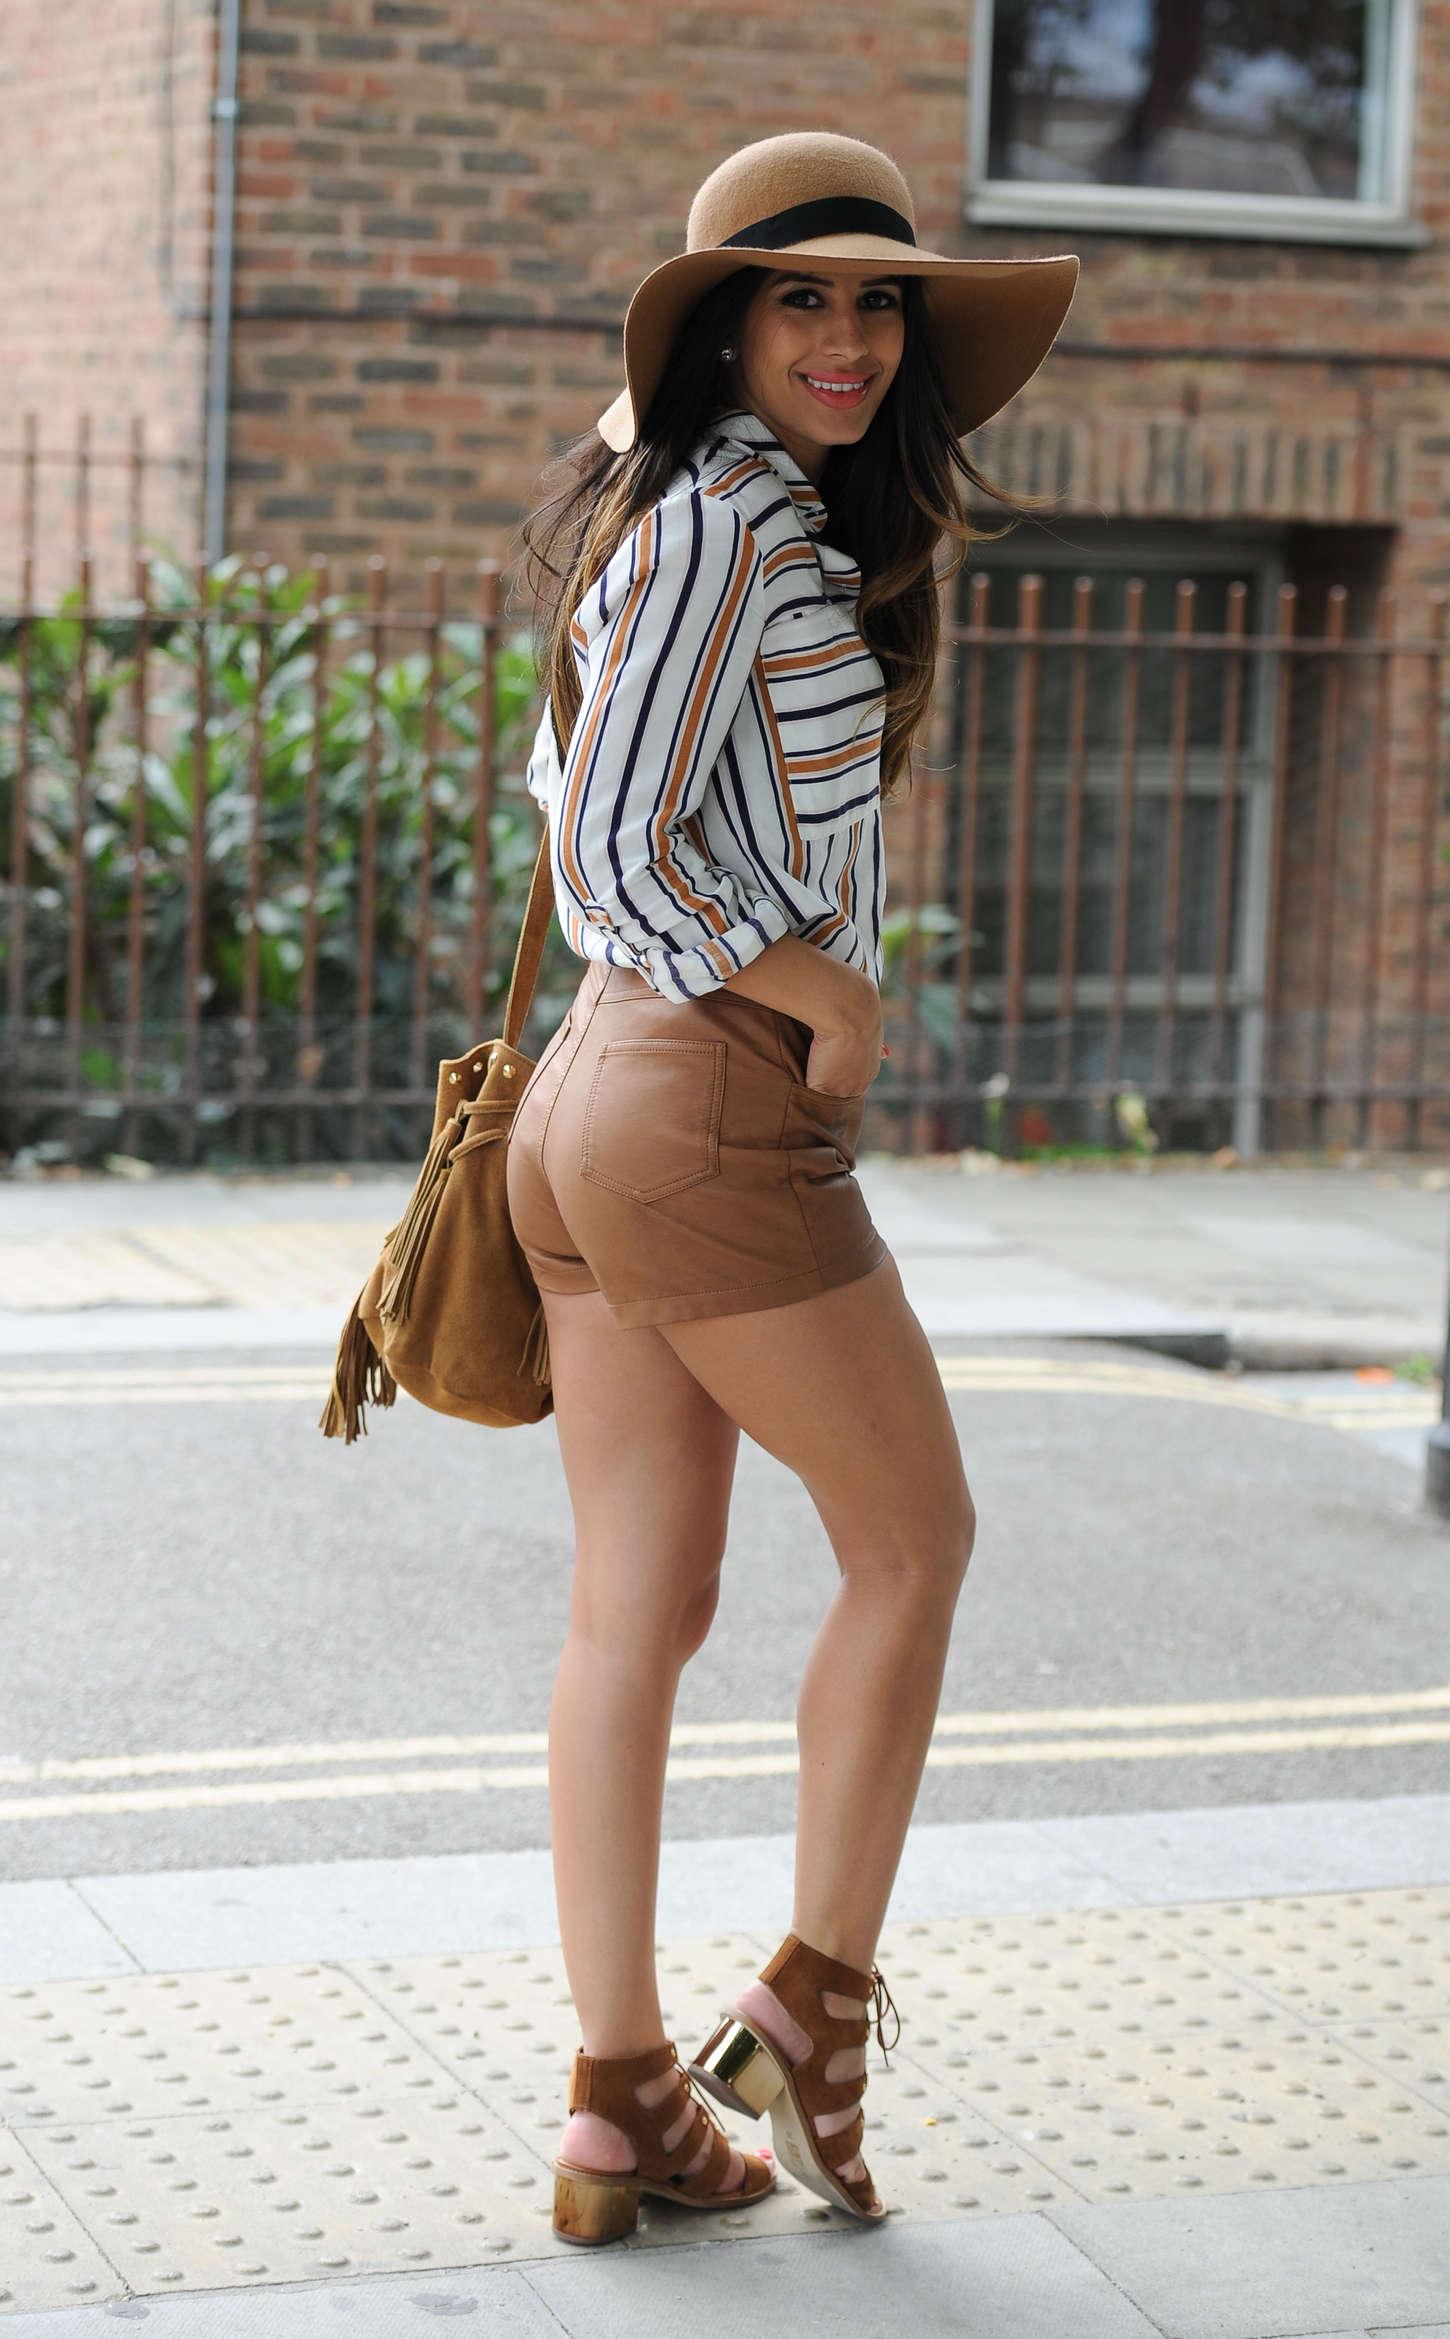 Jasmin Walia - Filming for Desi Rascals in Camden Lindsay Lohan